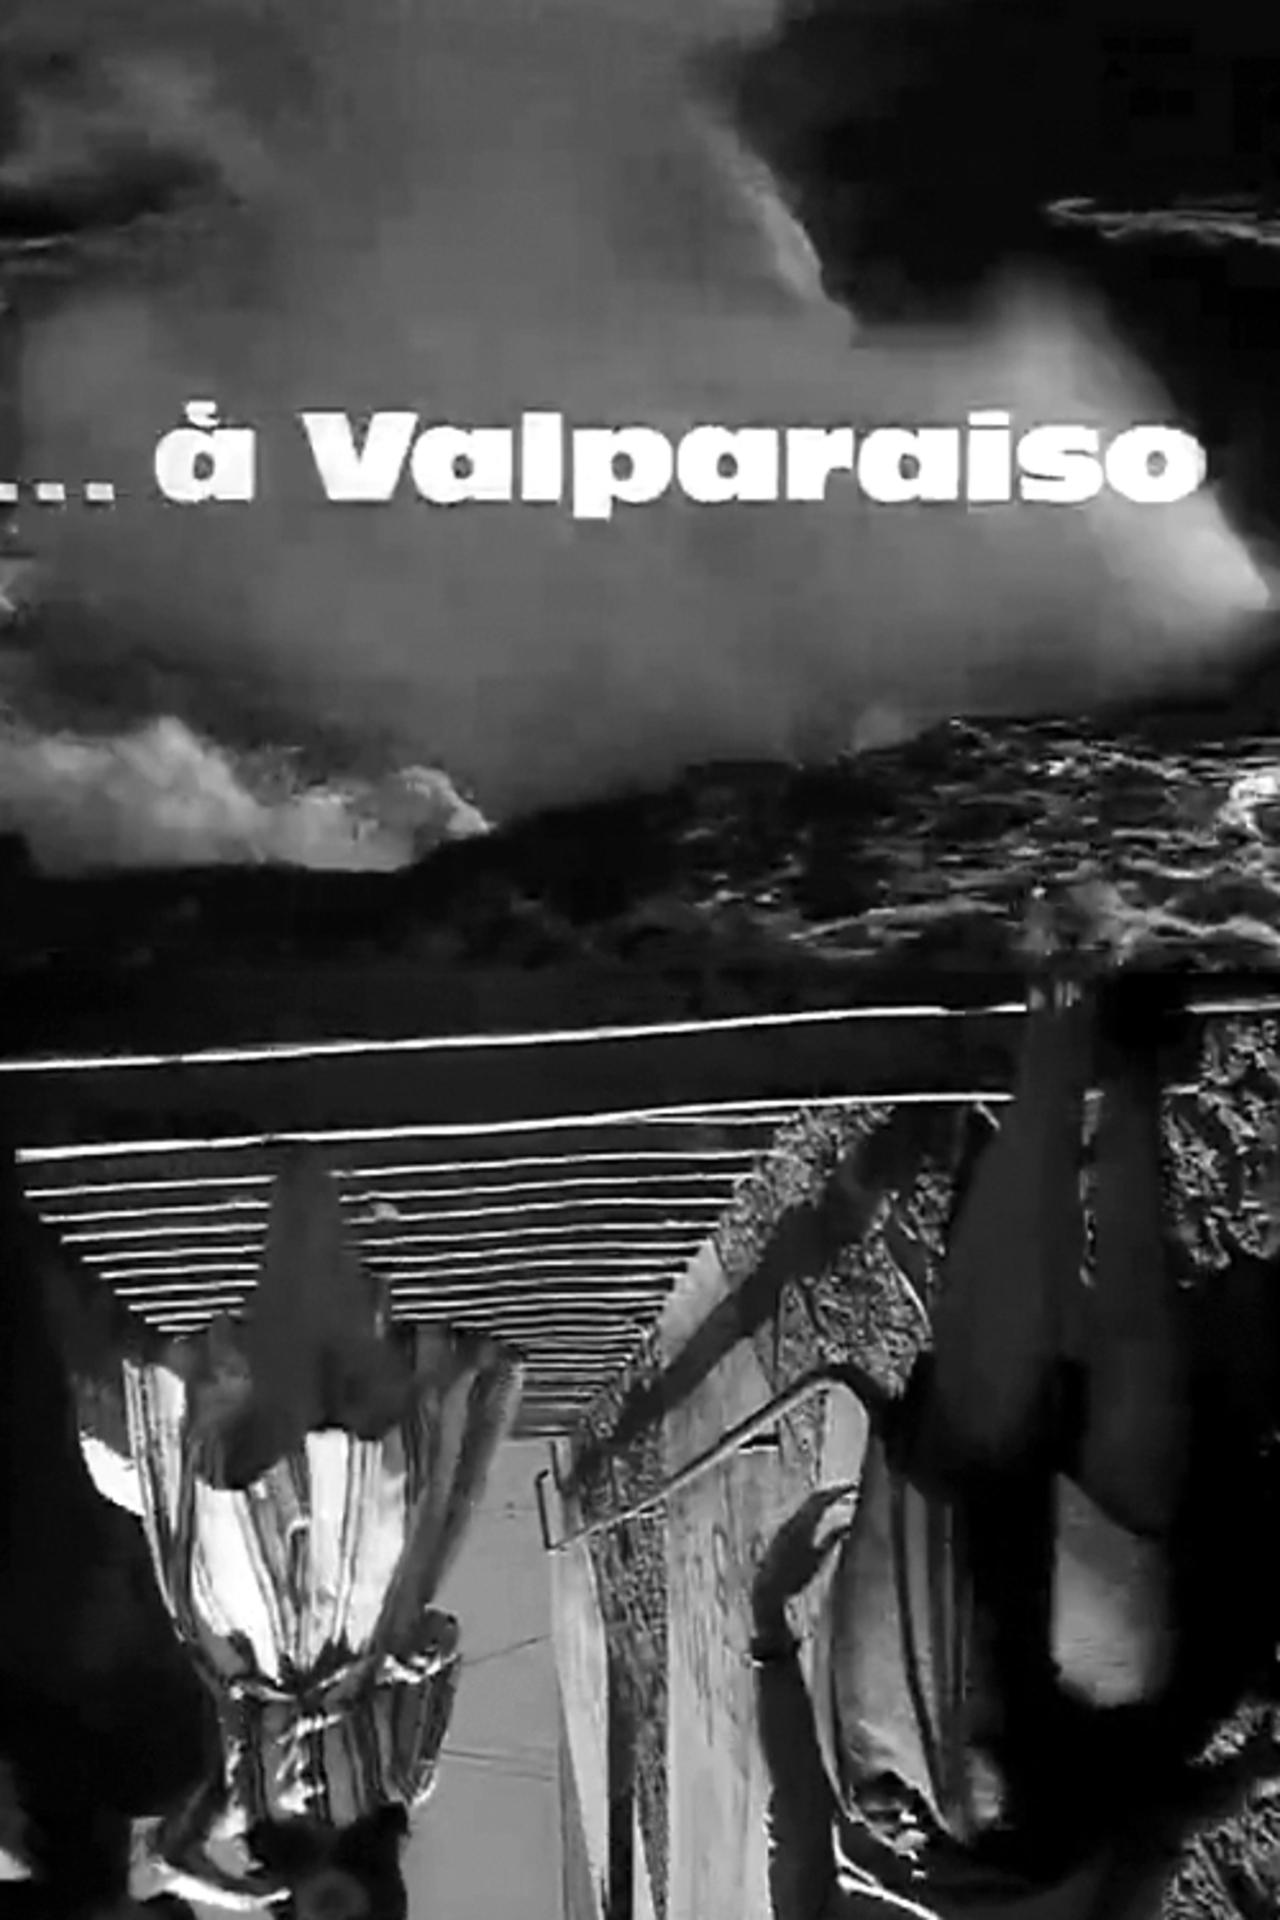 ...A Valparaíso kapak